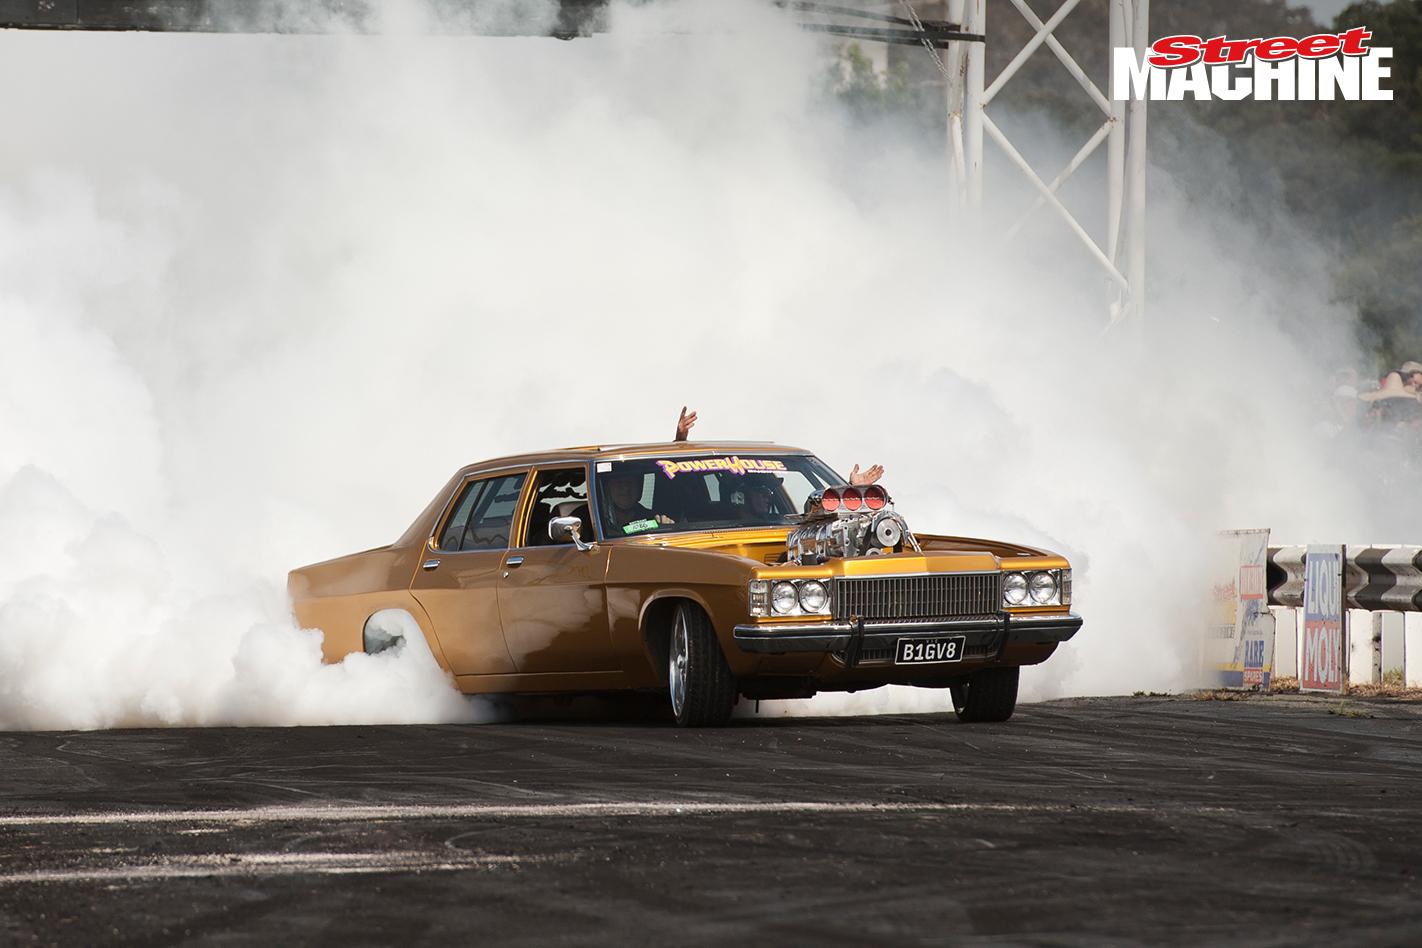 Holden Statesman Blown Burnout BIGV8